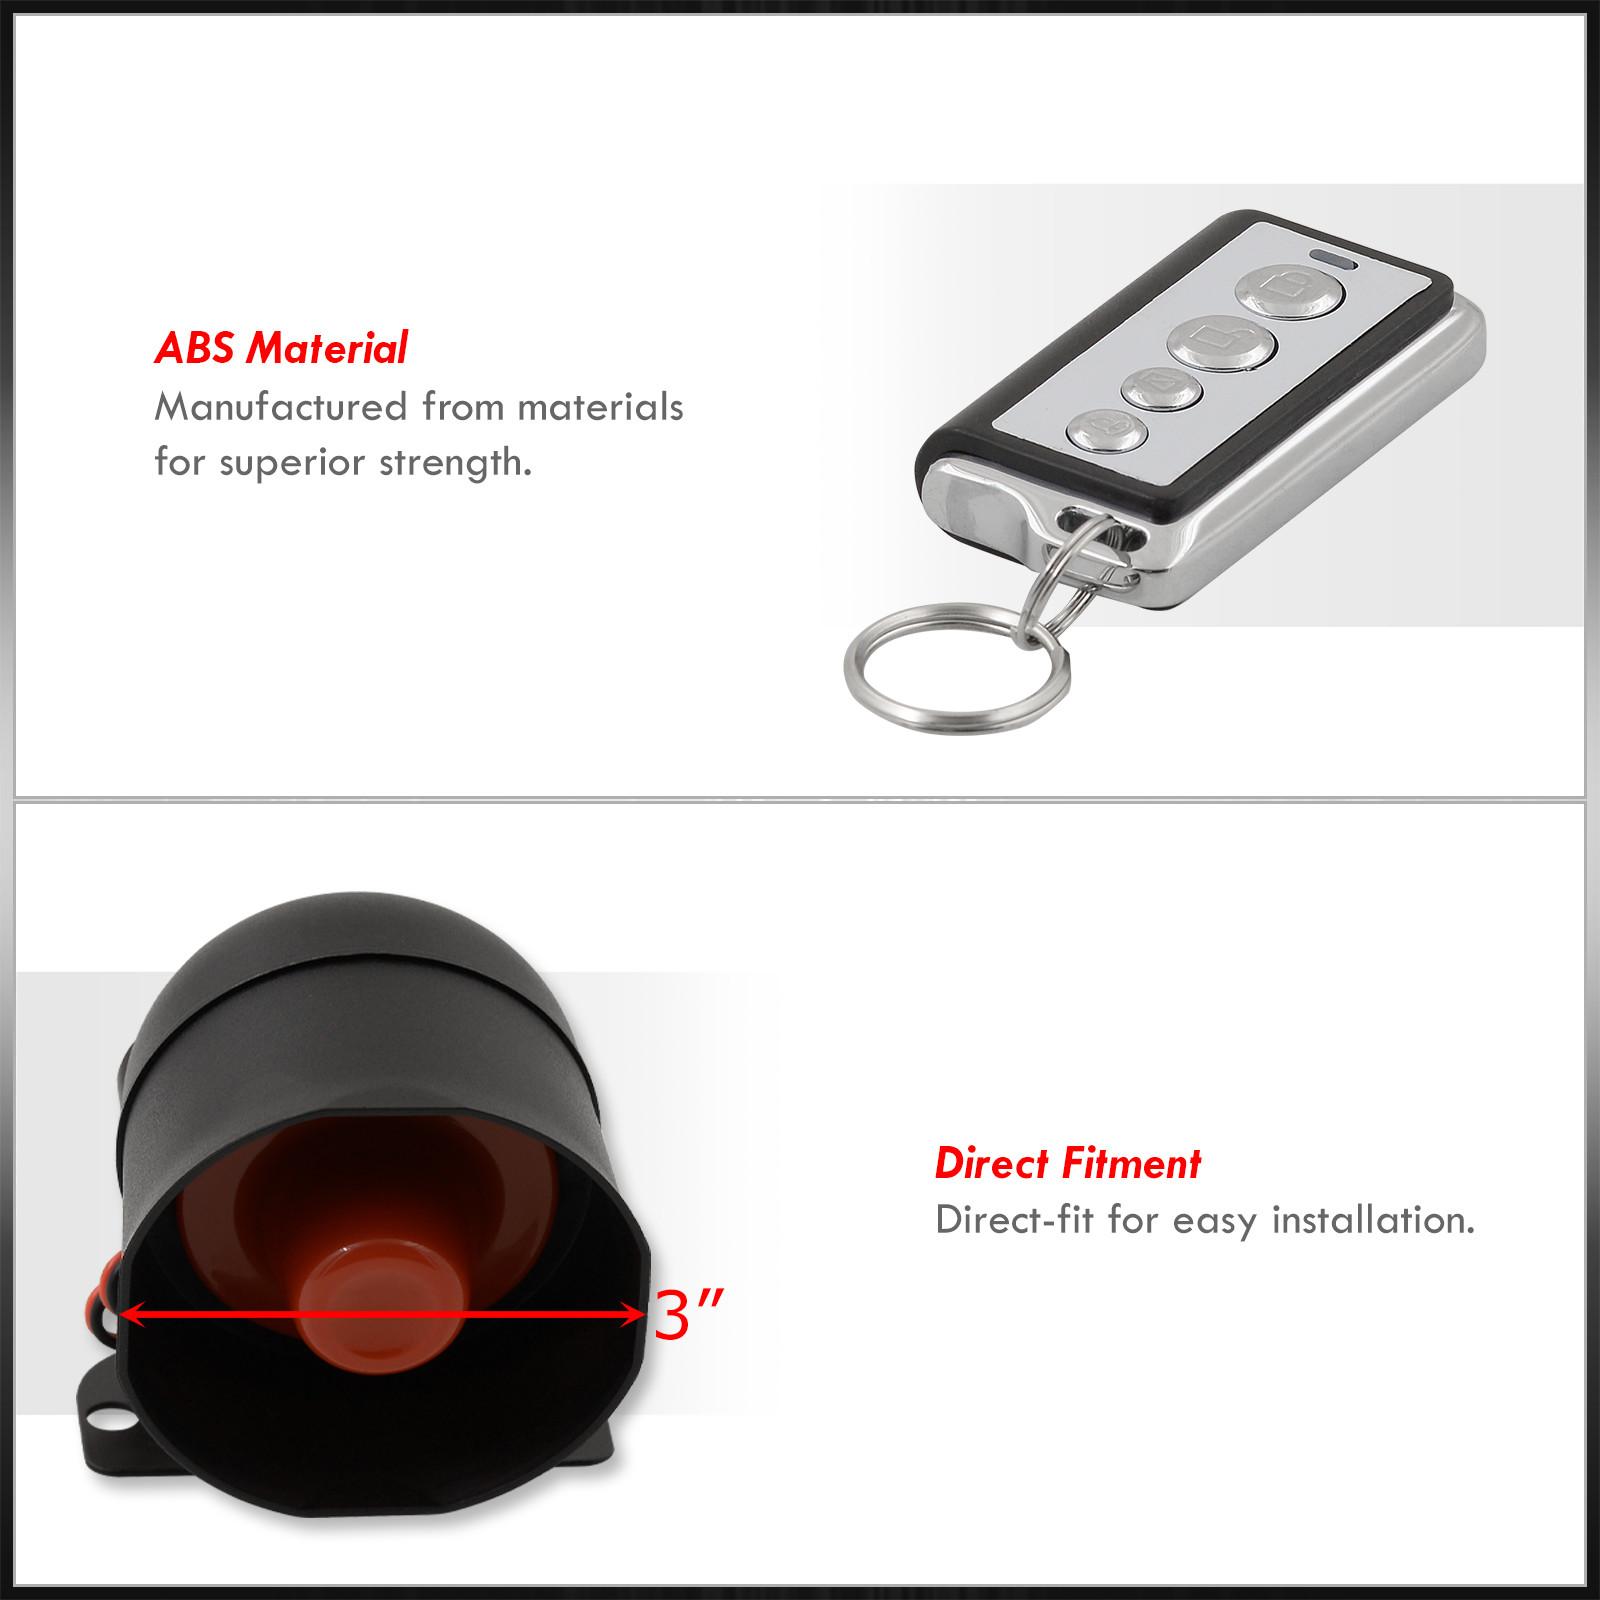 autopage alarm wiring diagram 2002 chevy trailblazer radio free